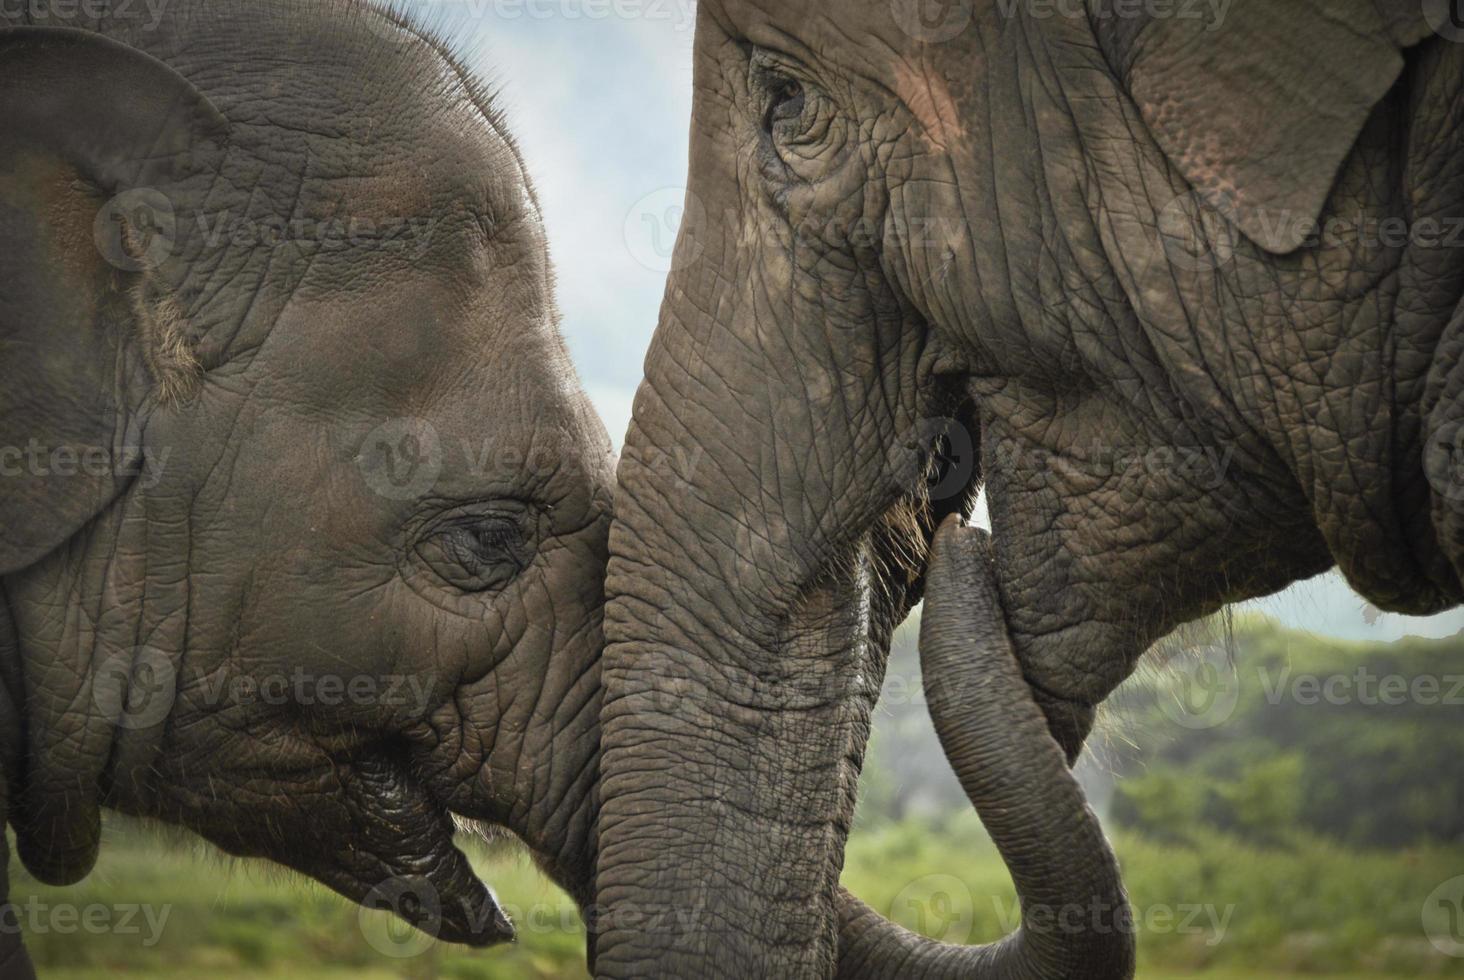 momento intimo tra madre ed elefantino foto